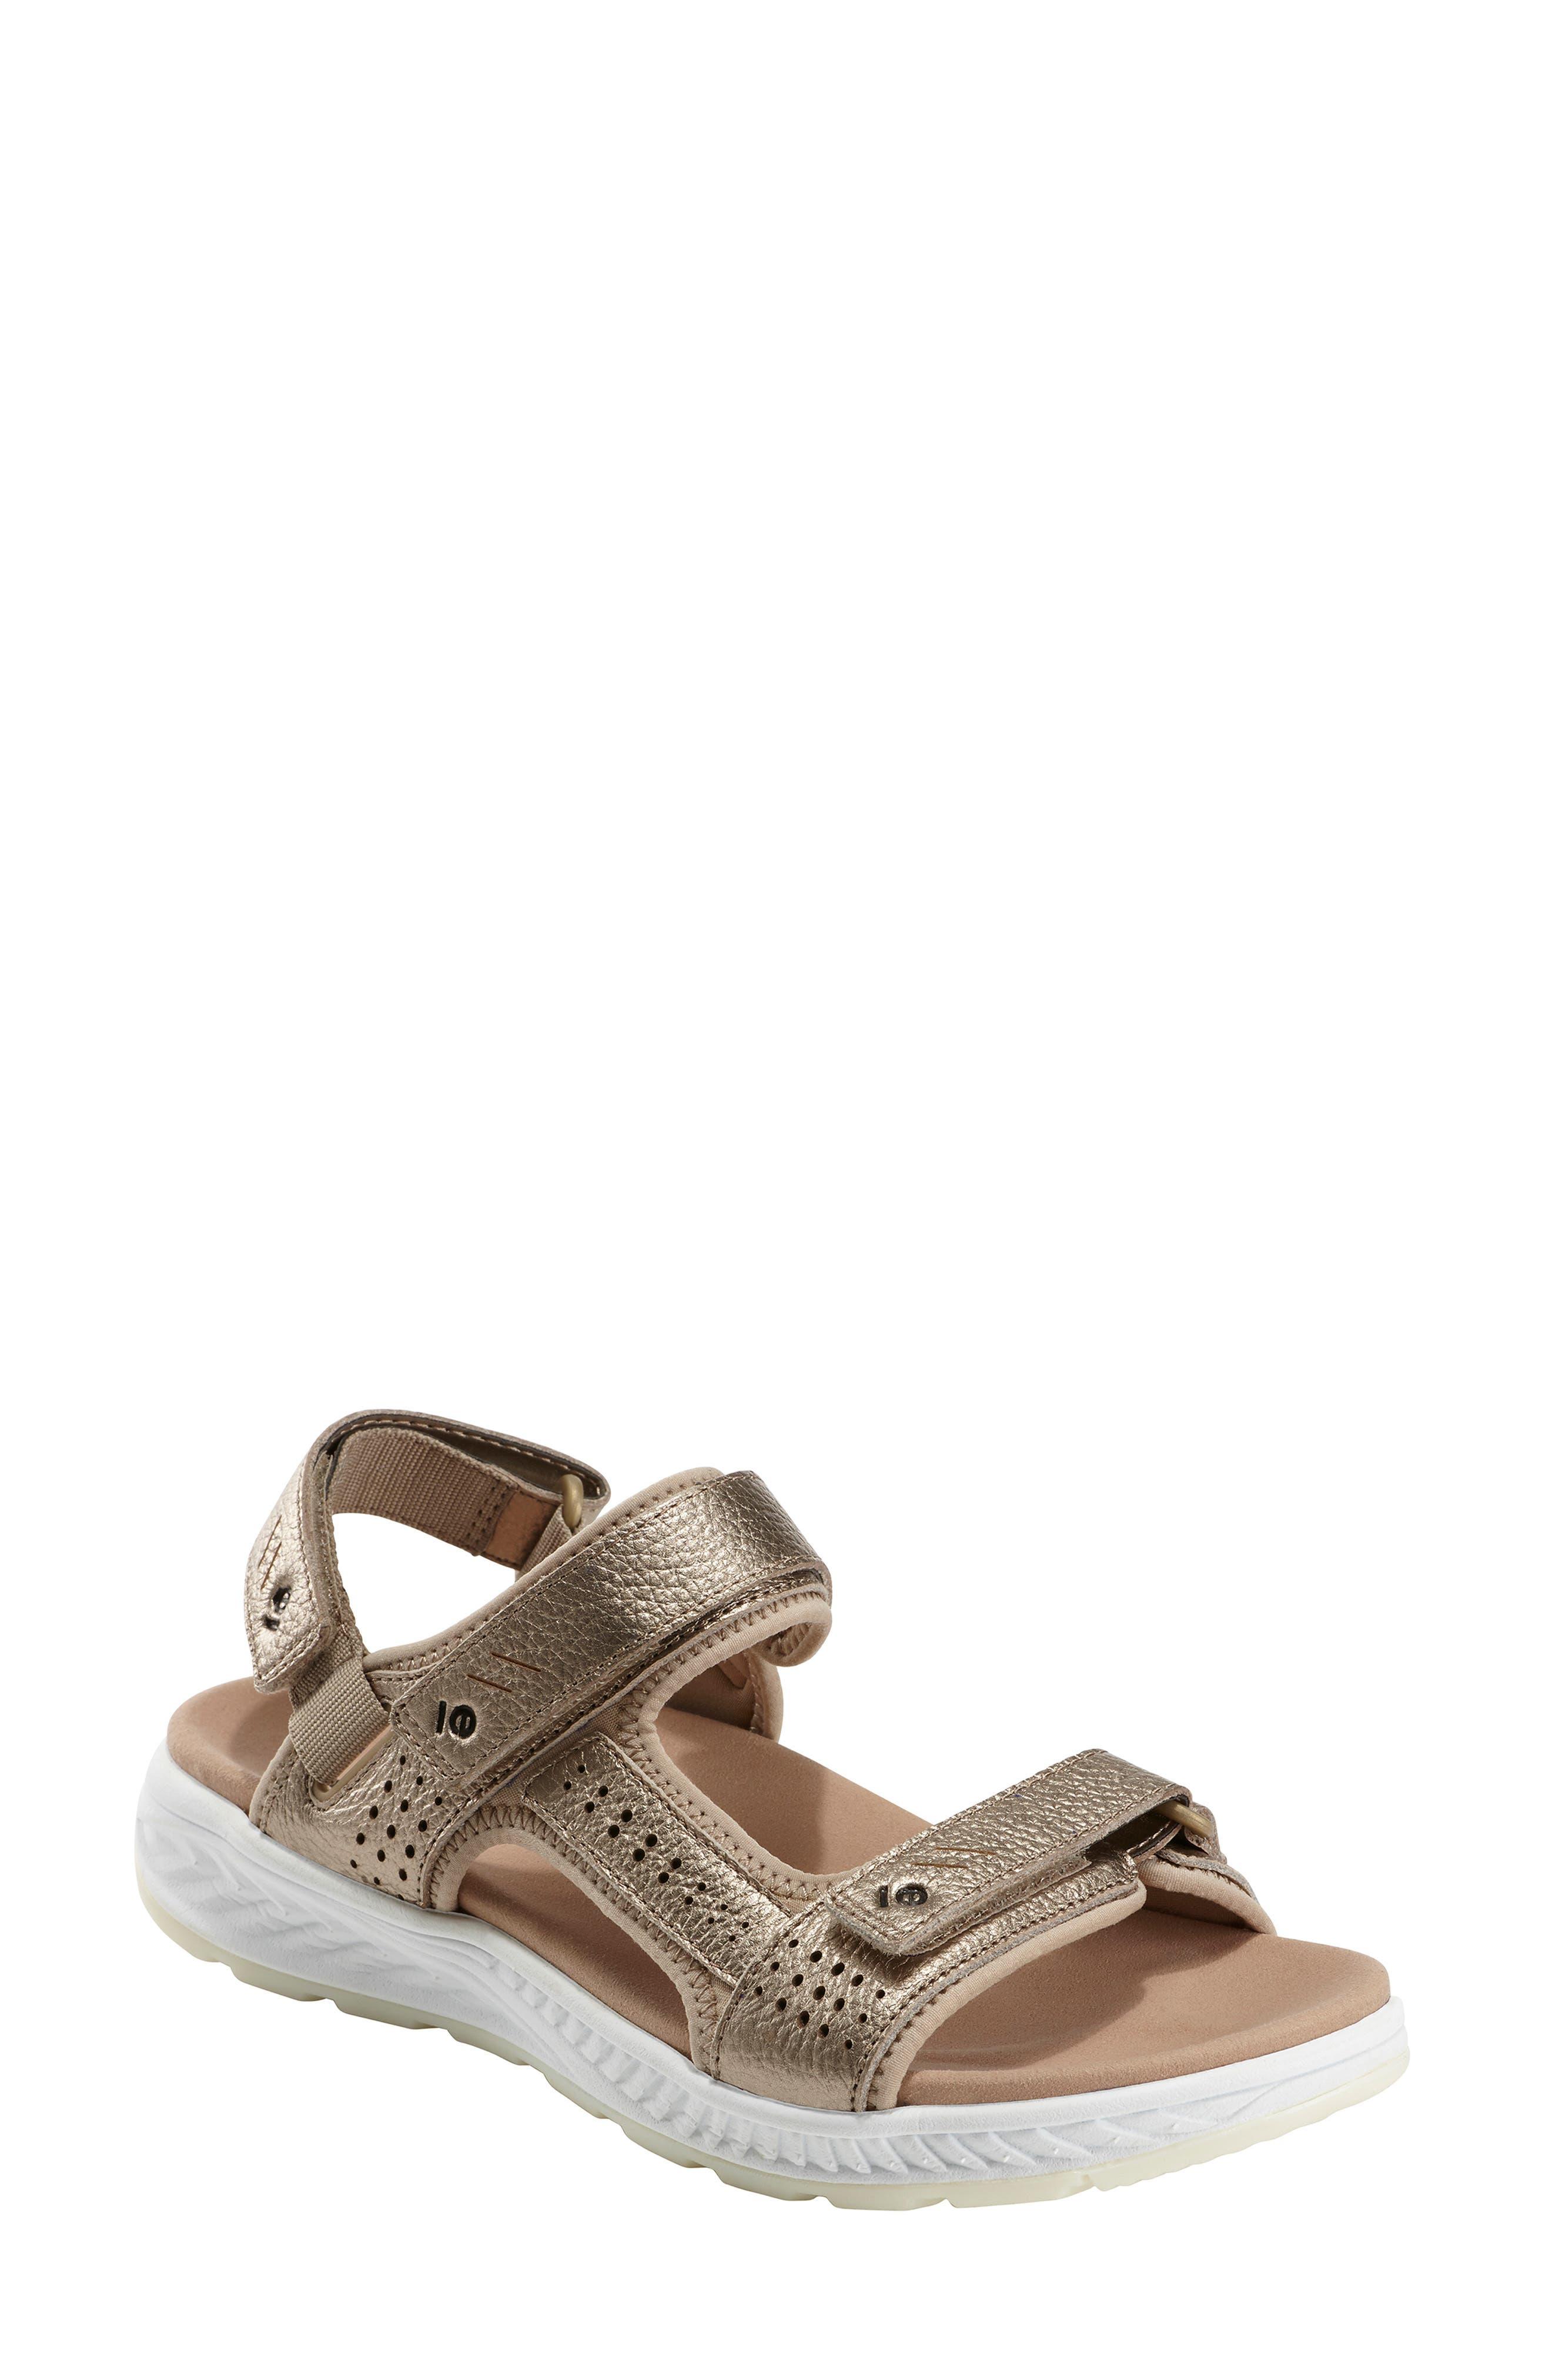 Earth Azore Sandal, Metallic